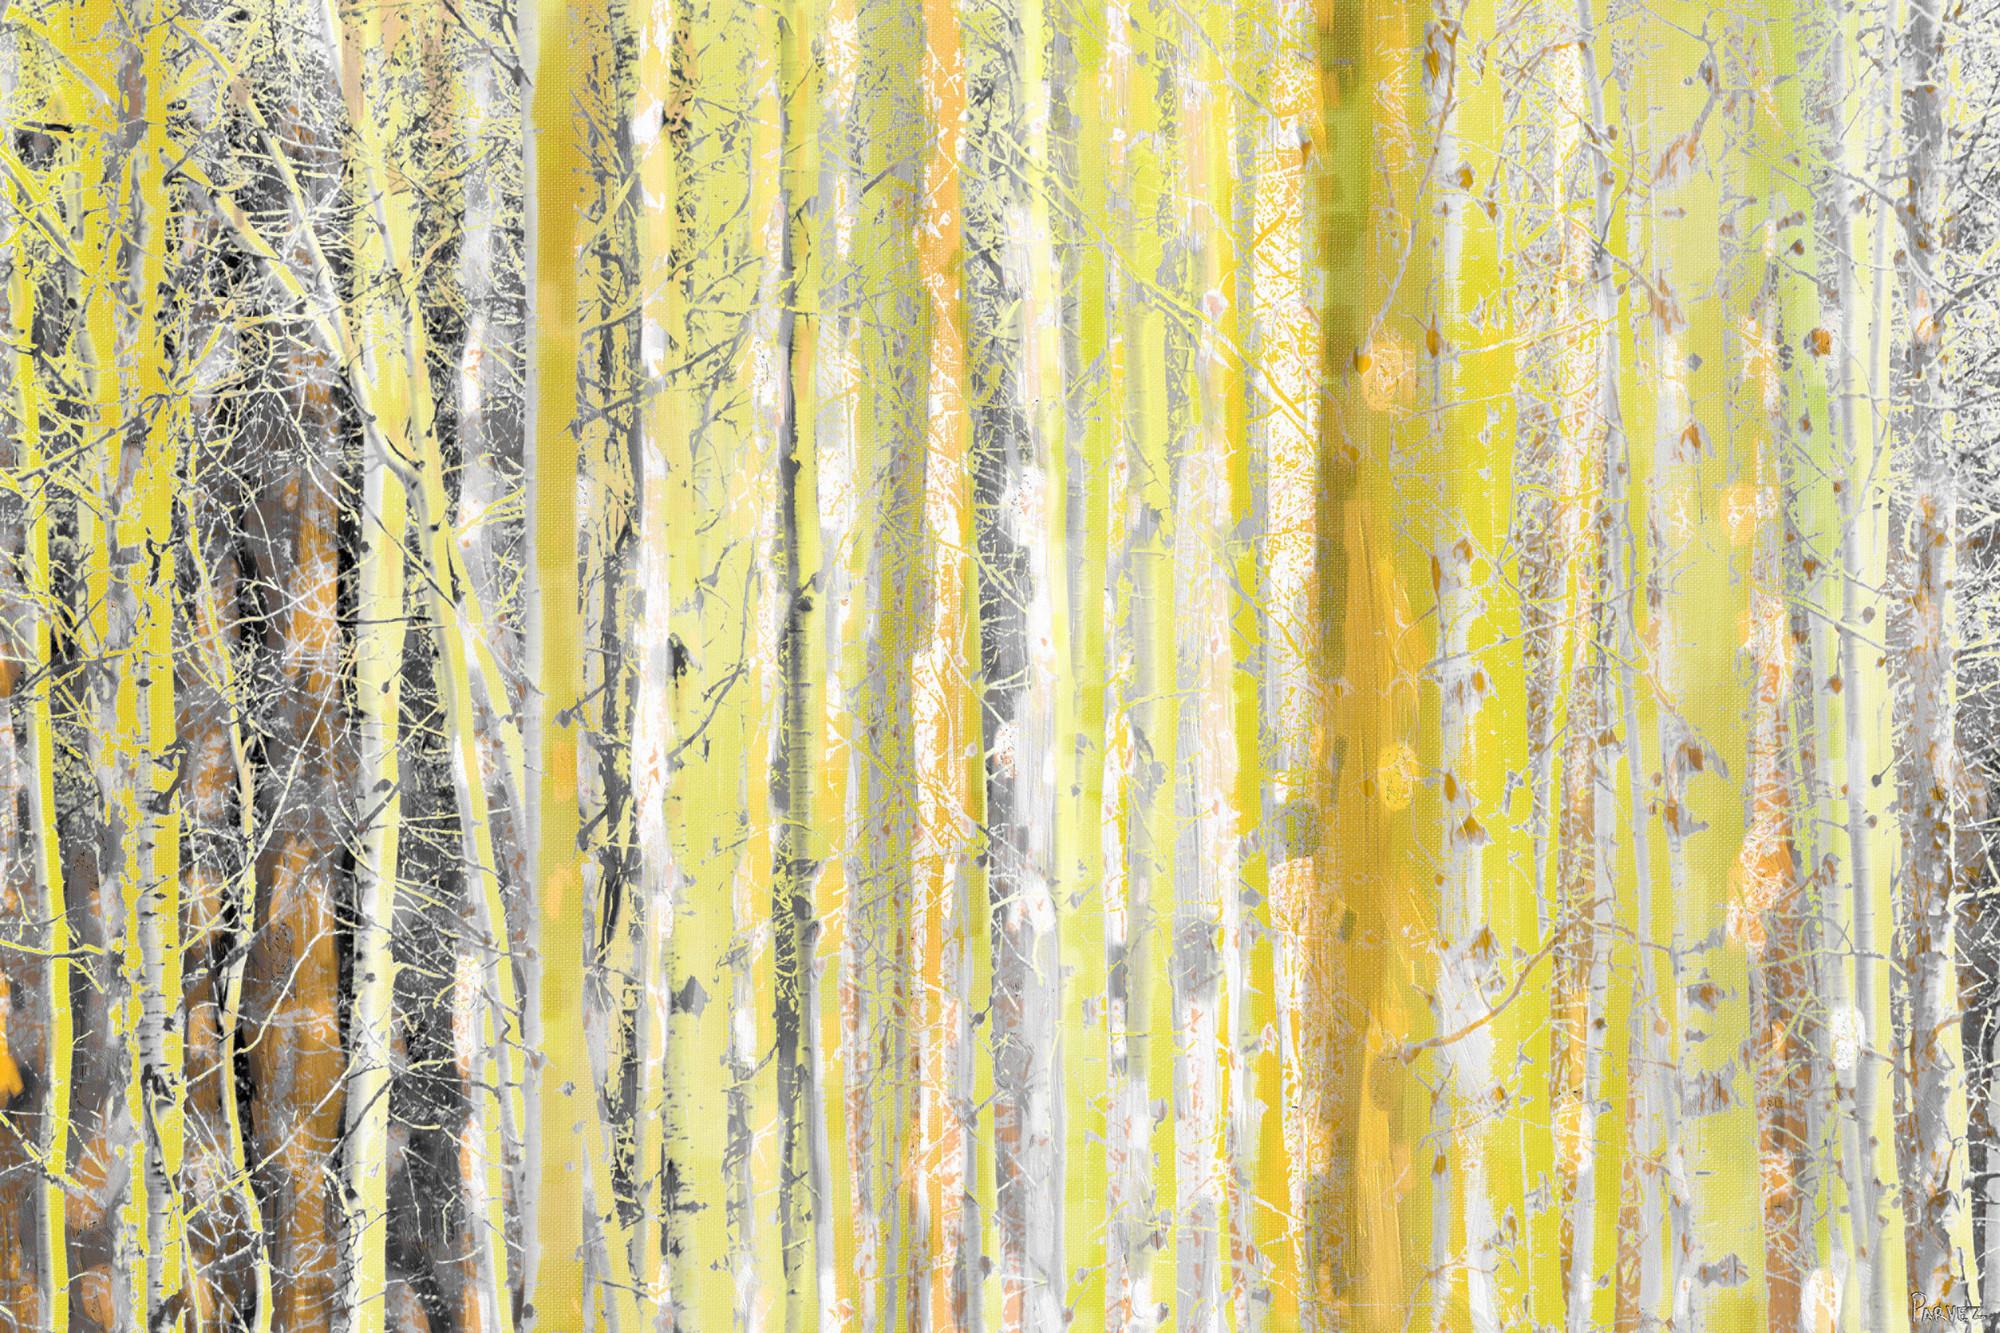 Best Aspen Tree Wall Art Ideas - The Wall Art Decorations ...